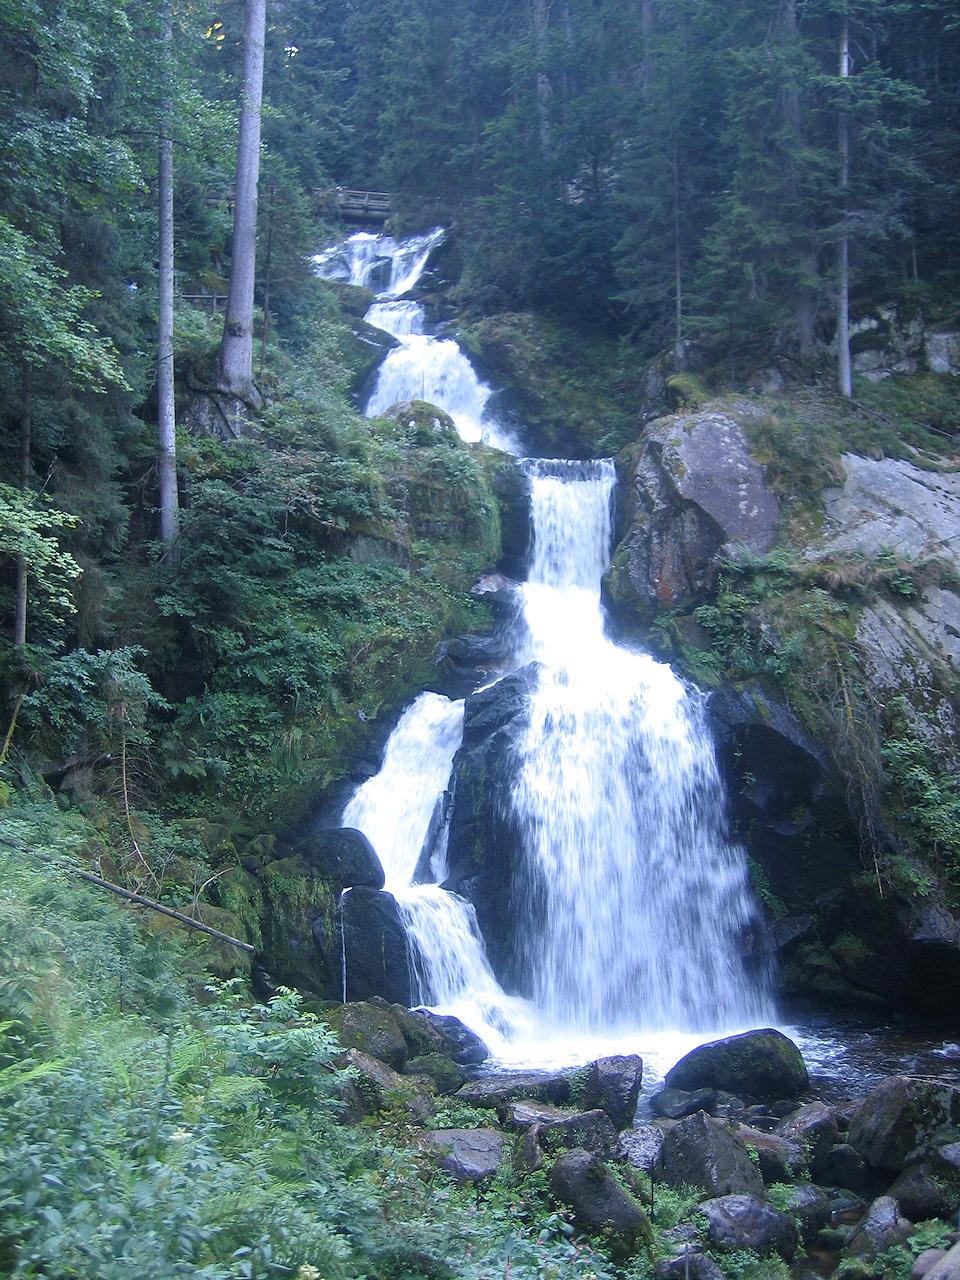 triberg waterfalls germany s highest waterfalls